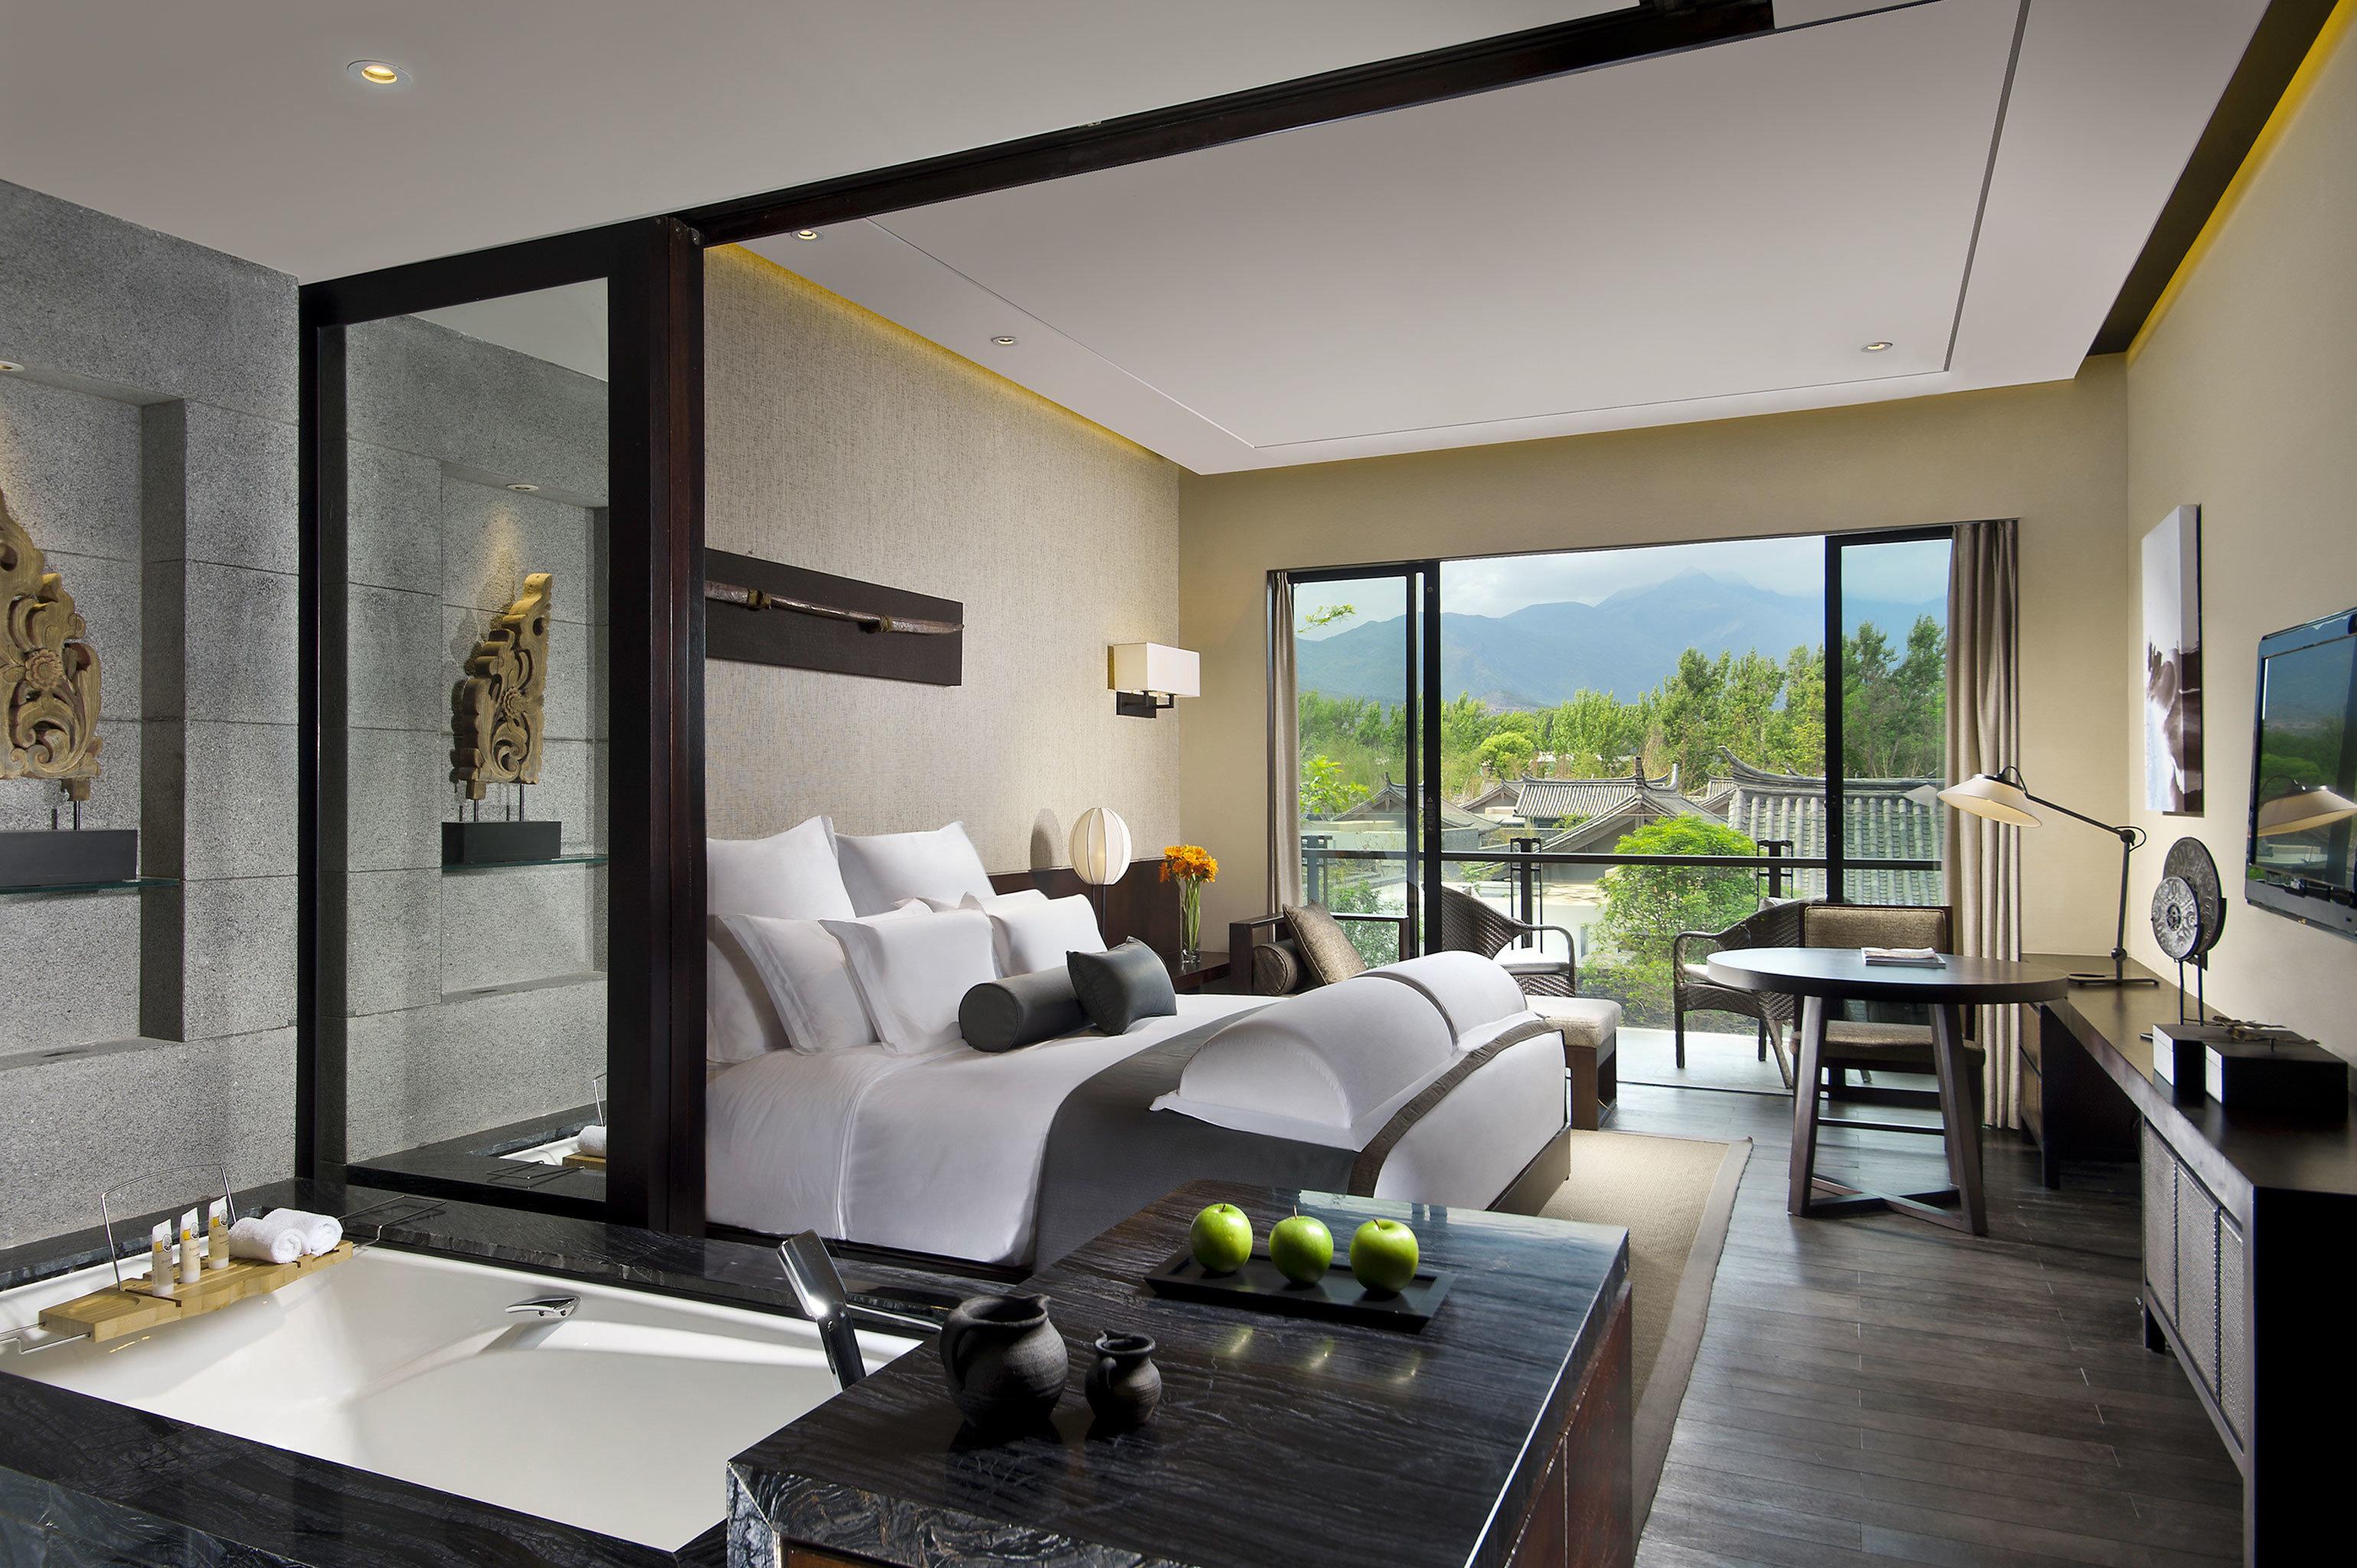 Balcony Bedroom Classic Resort Scenic views property living room condominium home Suite Villa